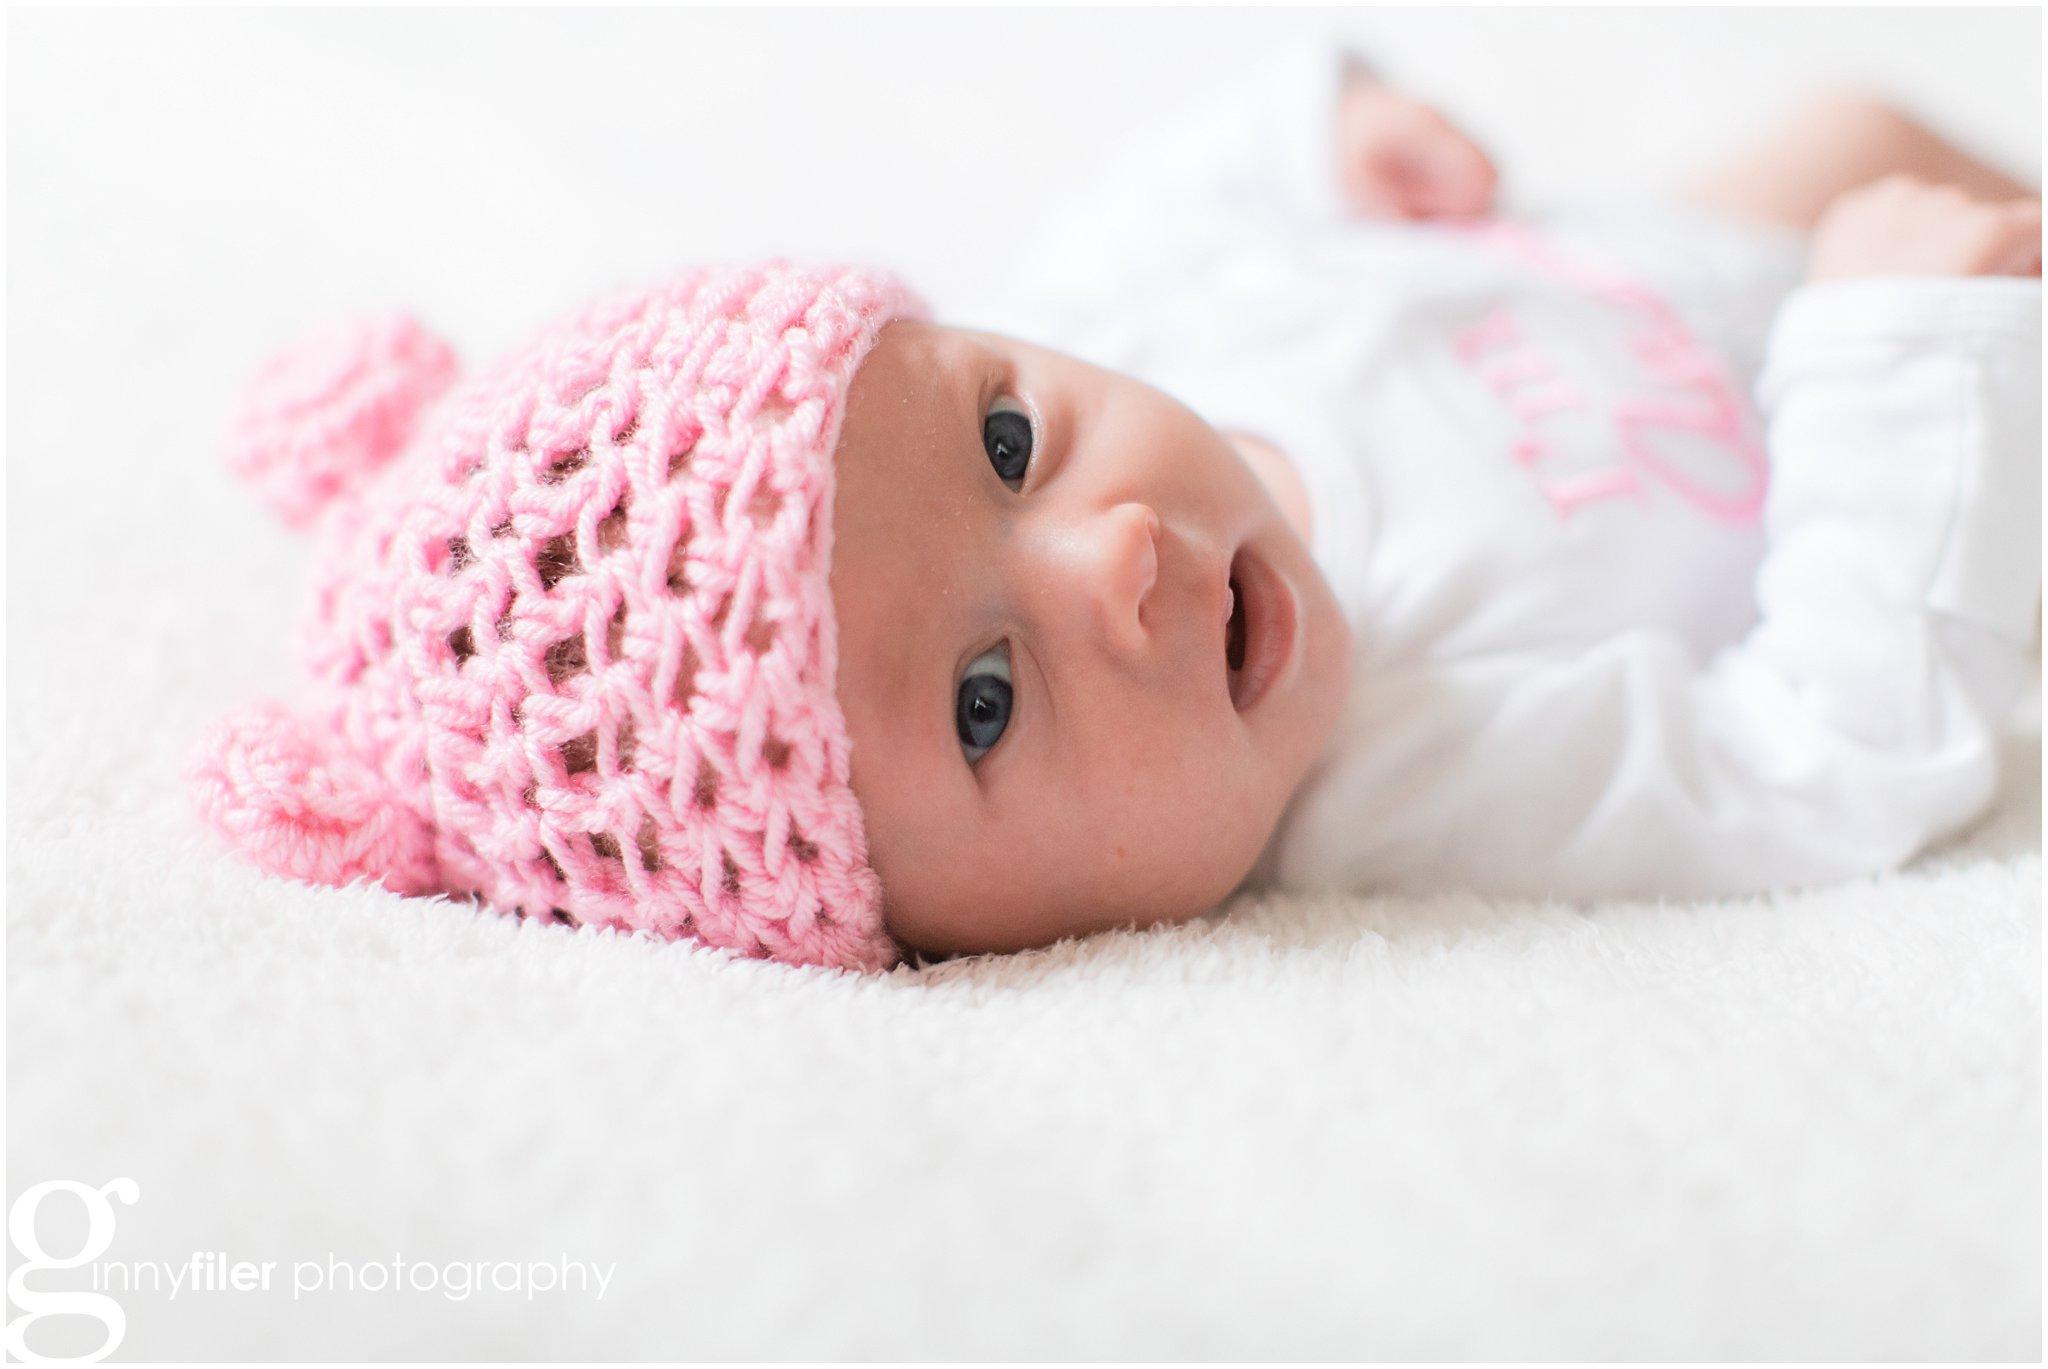 lifestyle_newborn_photography_0012.jpg